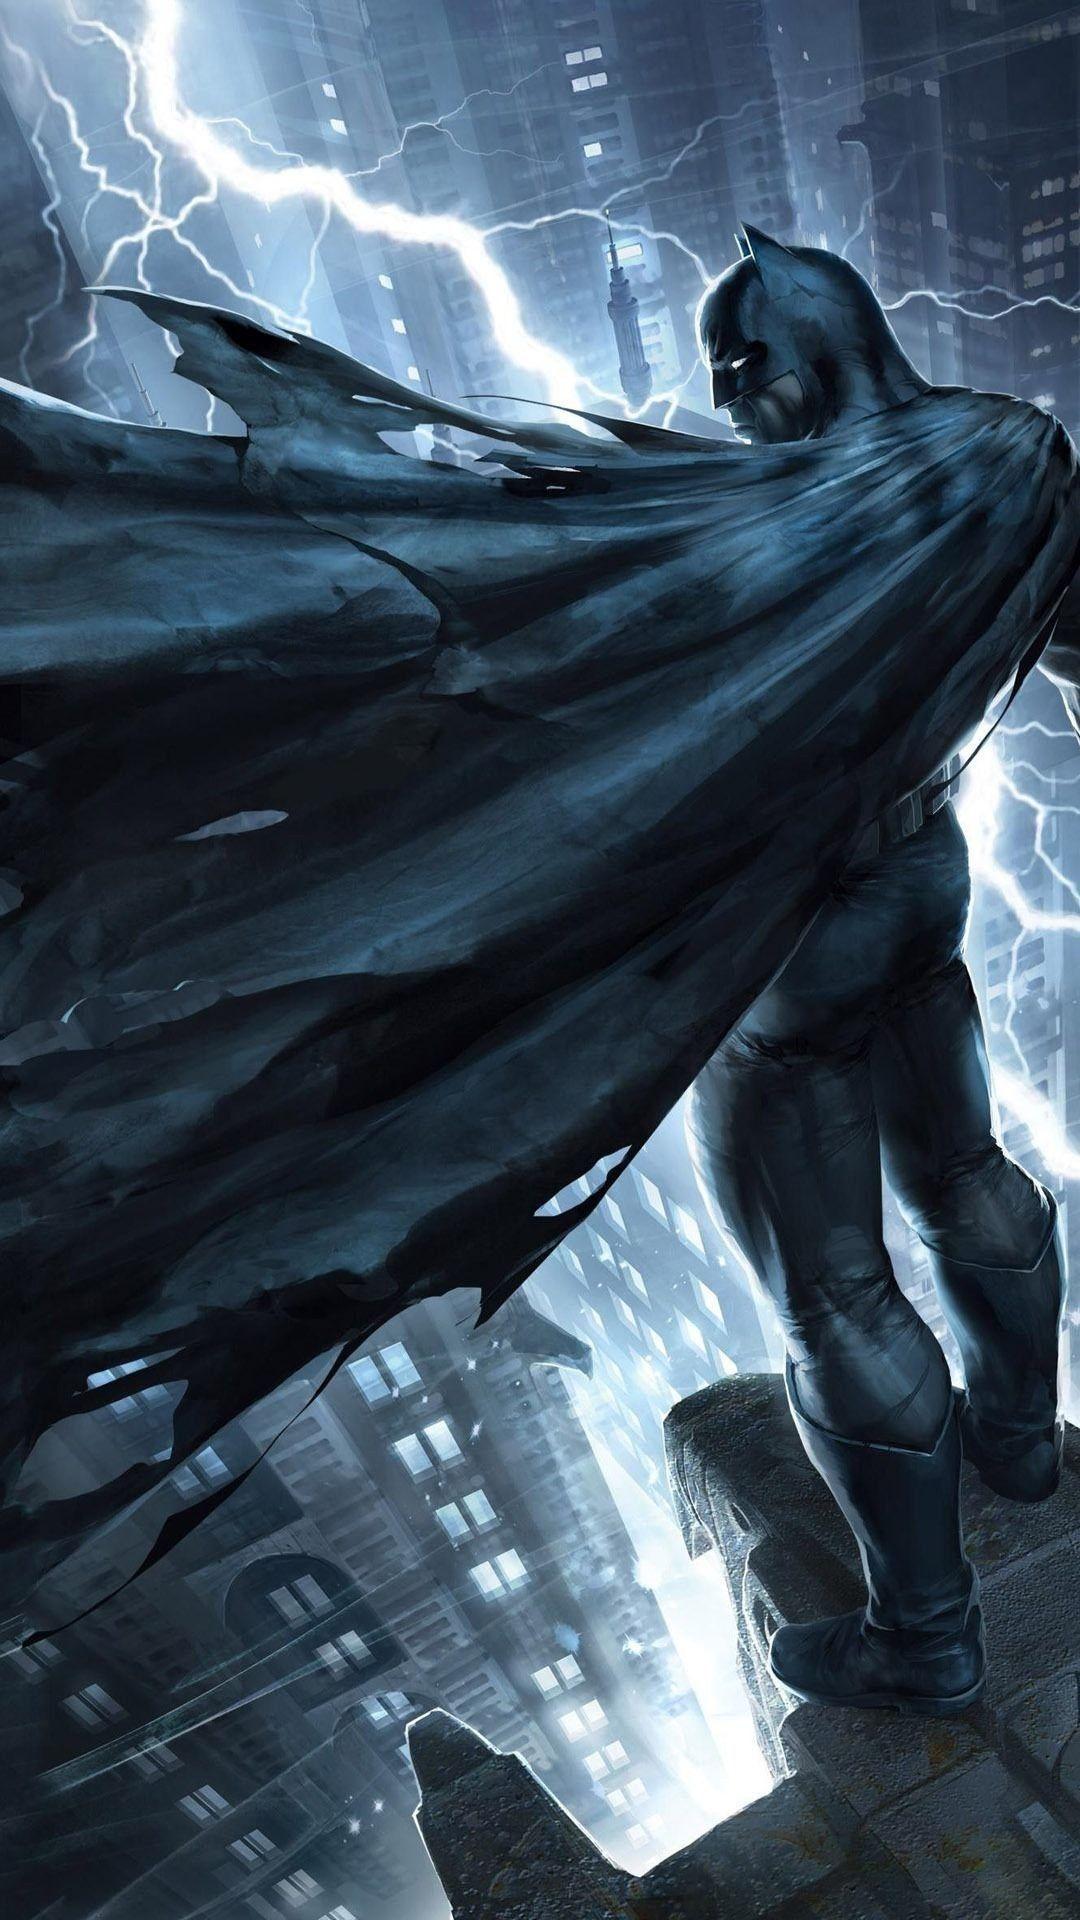 Pin by optimus 07 on marvel Batman comic wallpaper